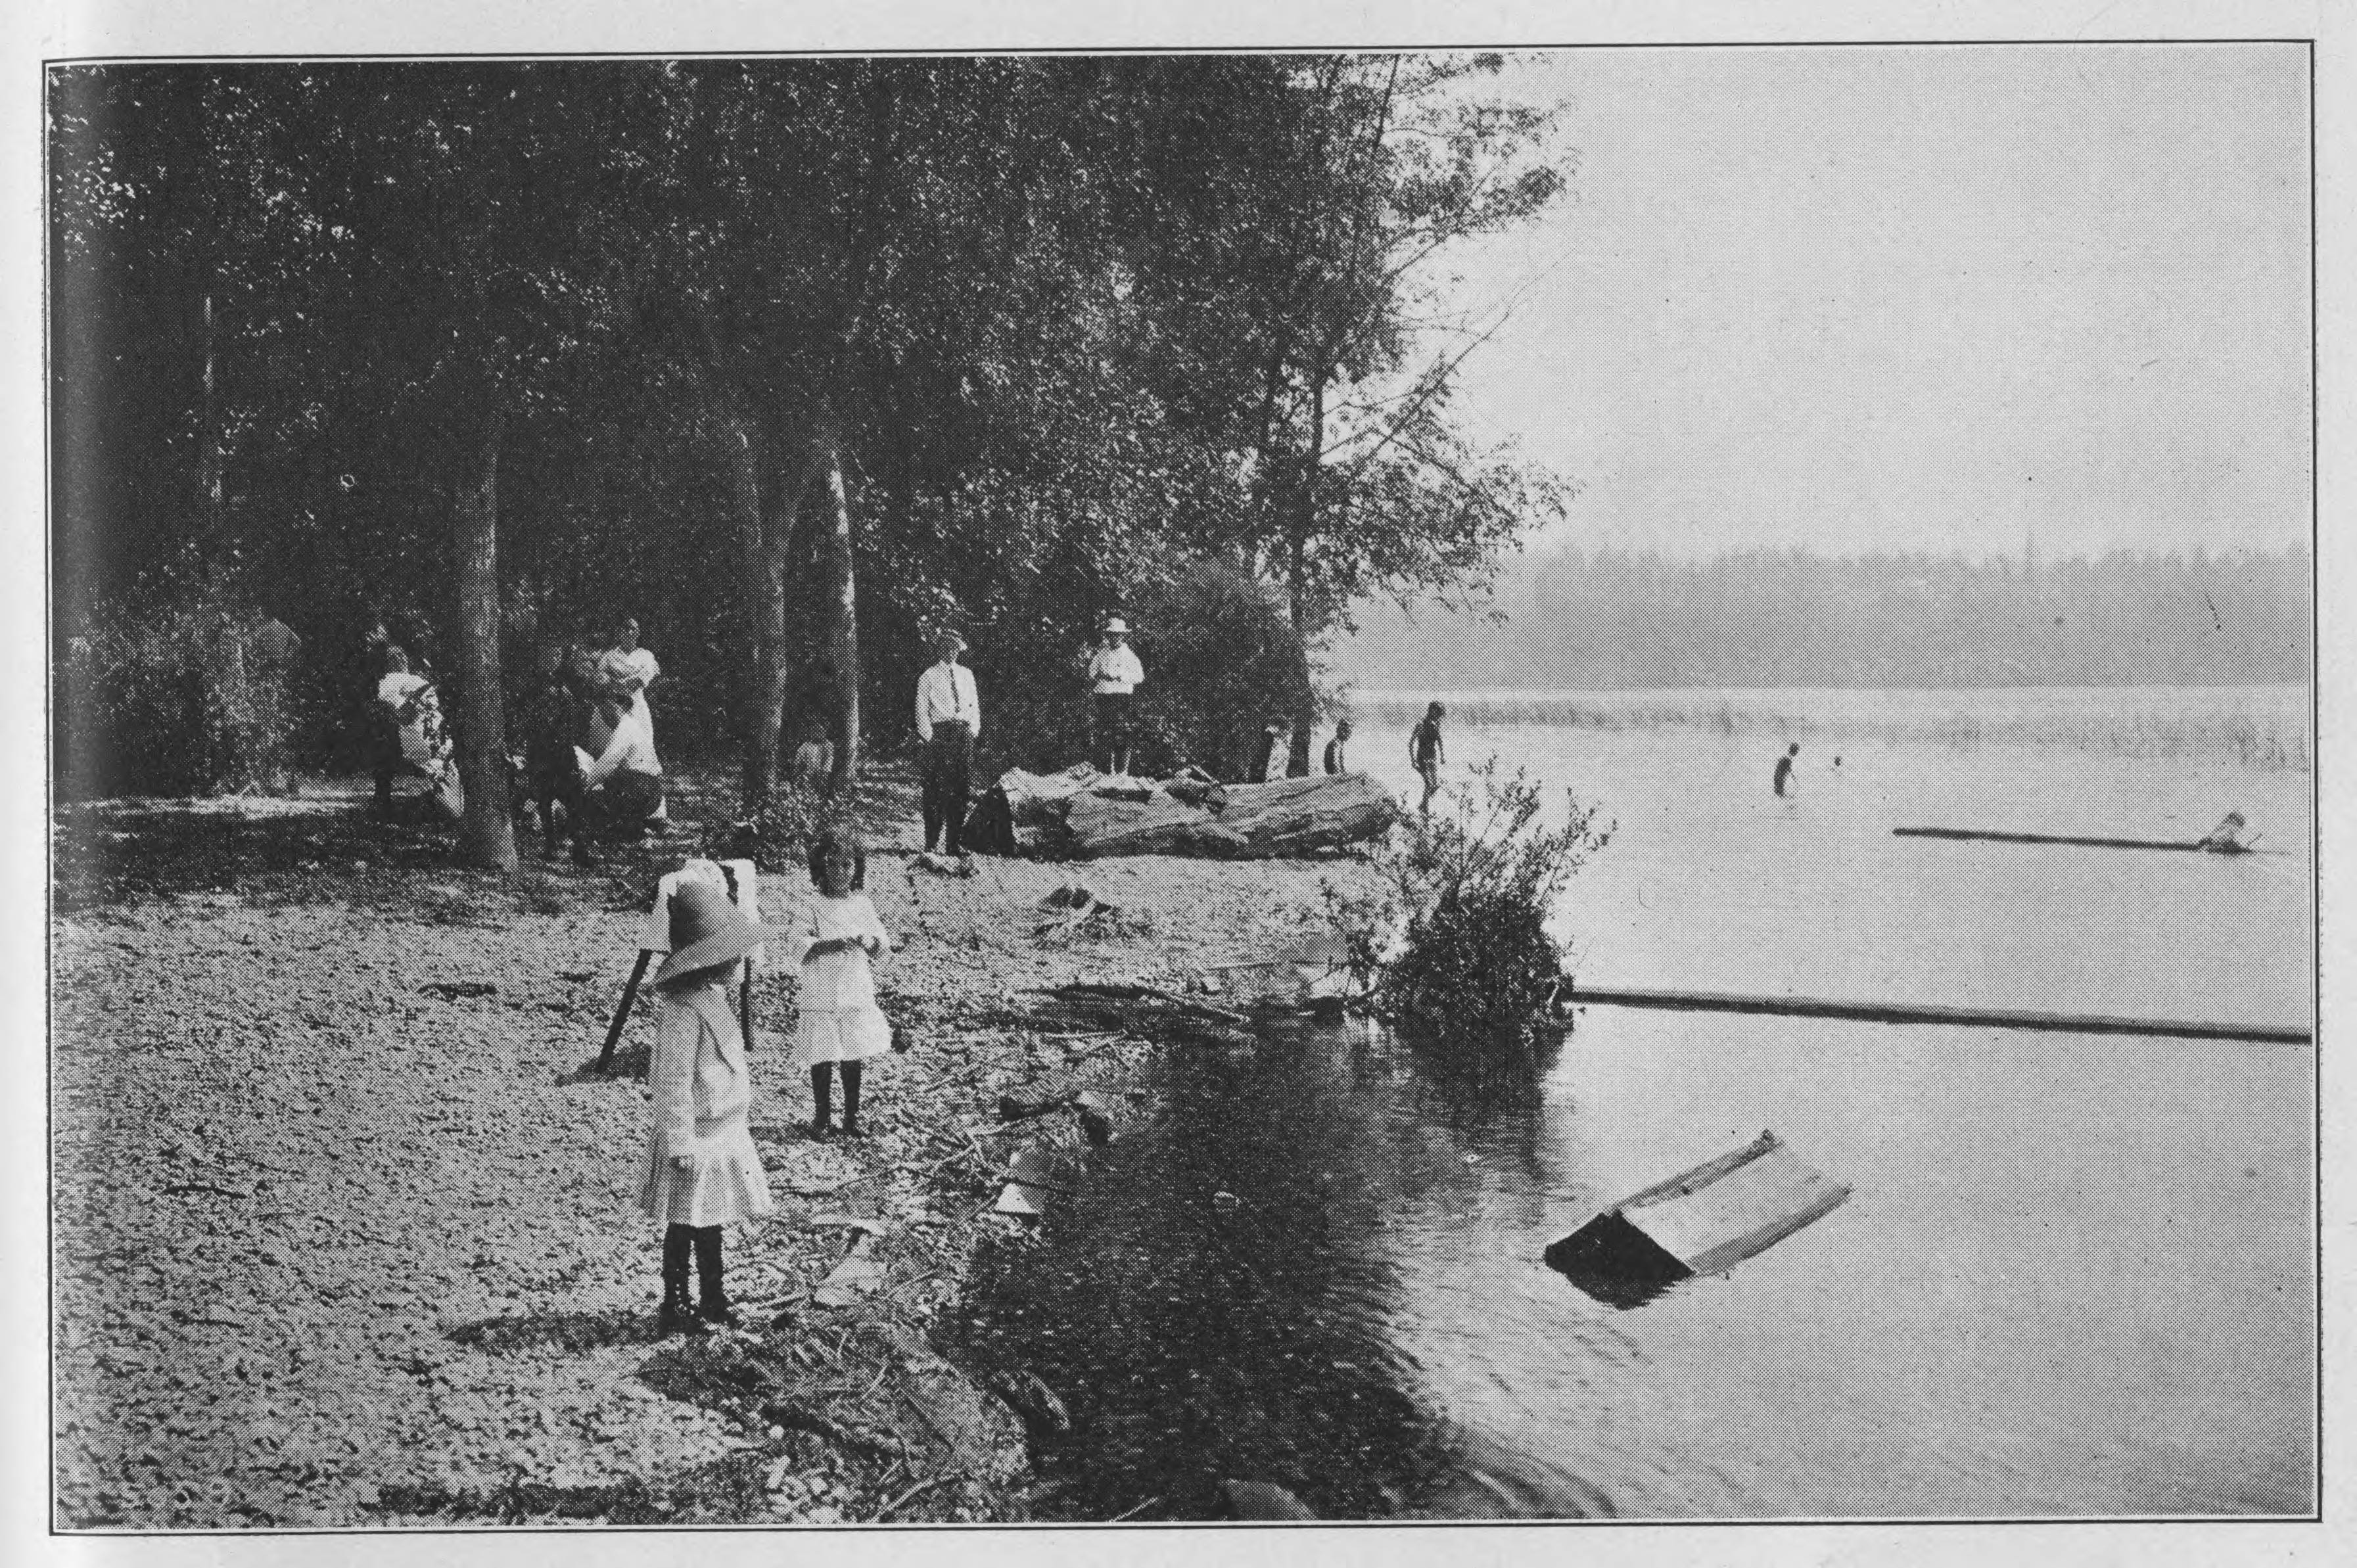 Seward Park, the pride of Rainier Valley, 1915